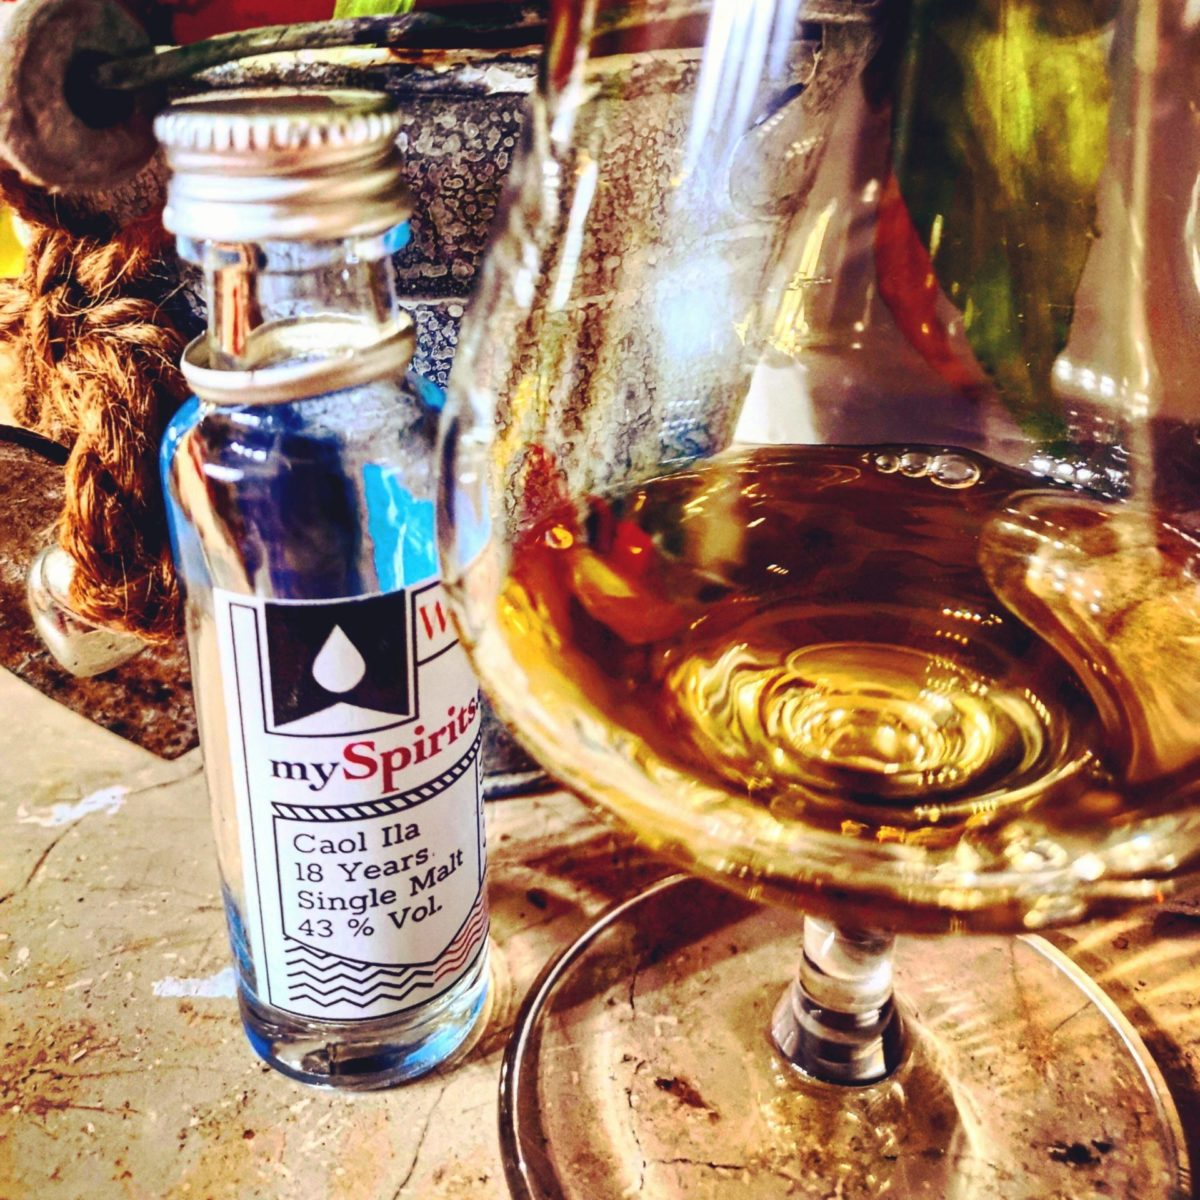 Caol Ila 18 Jahre Islay Single Malt Scotch Whisky